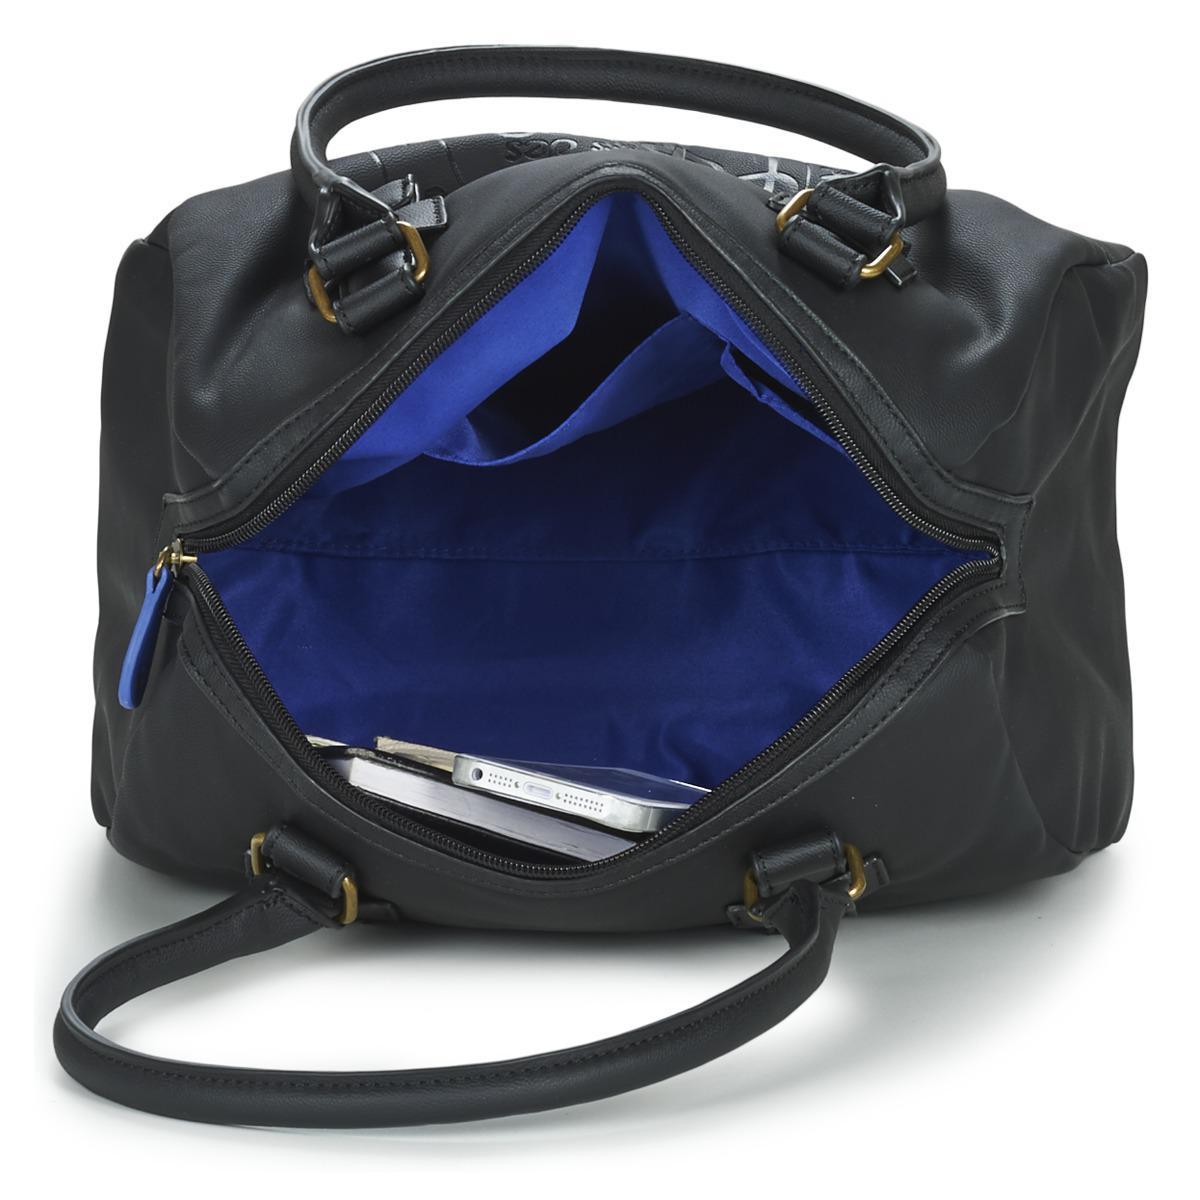 b503f79ef2 Le Temps Des Cerises Denver 5 Women's Handbags In Black in Black for ...